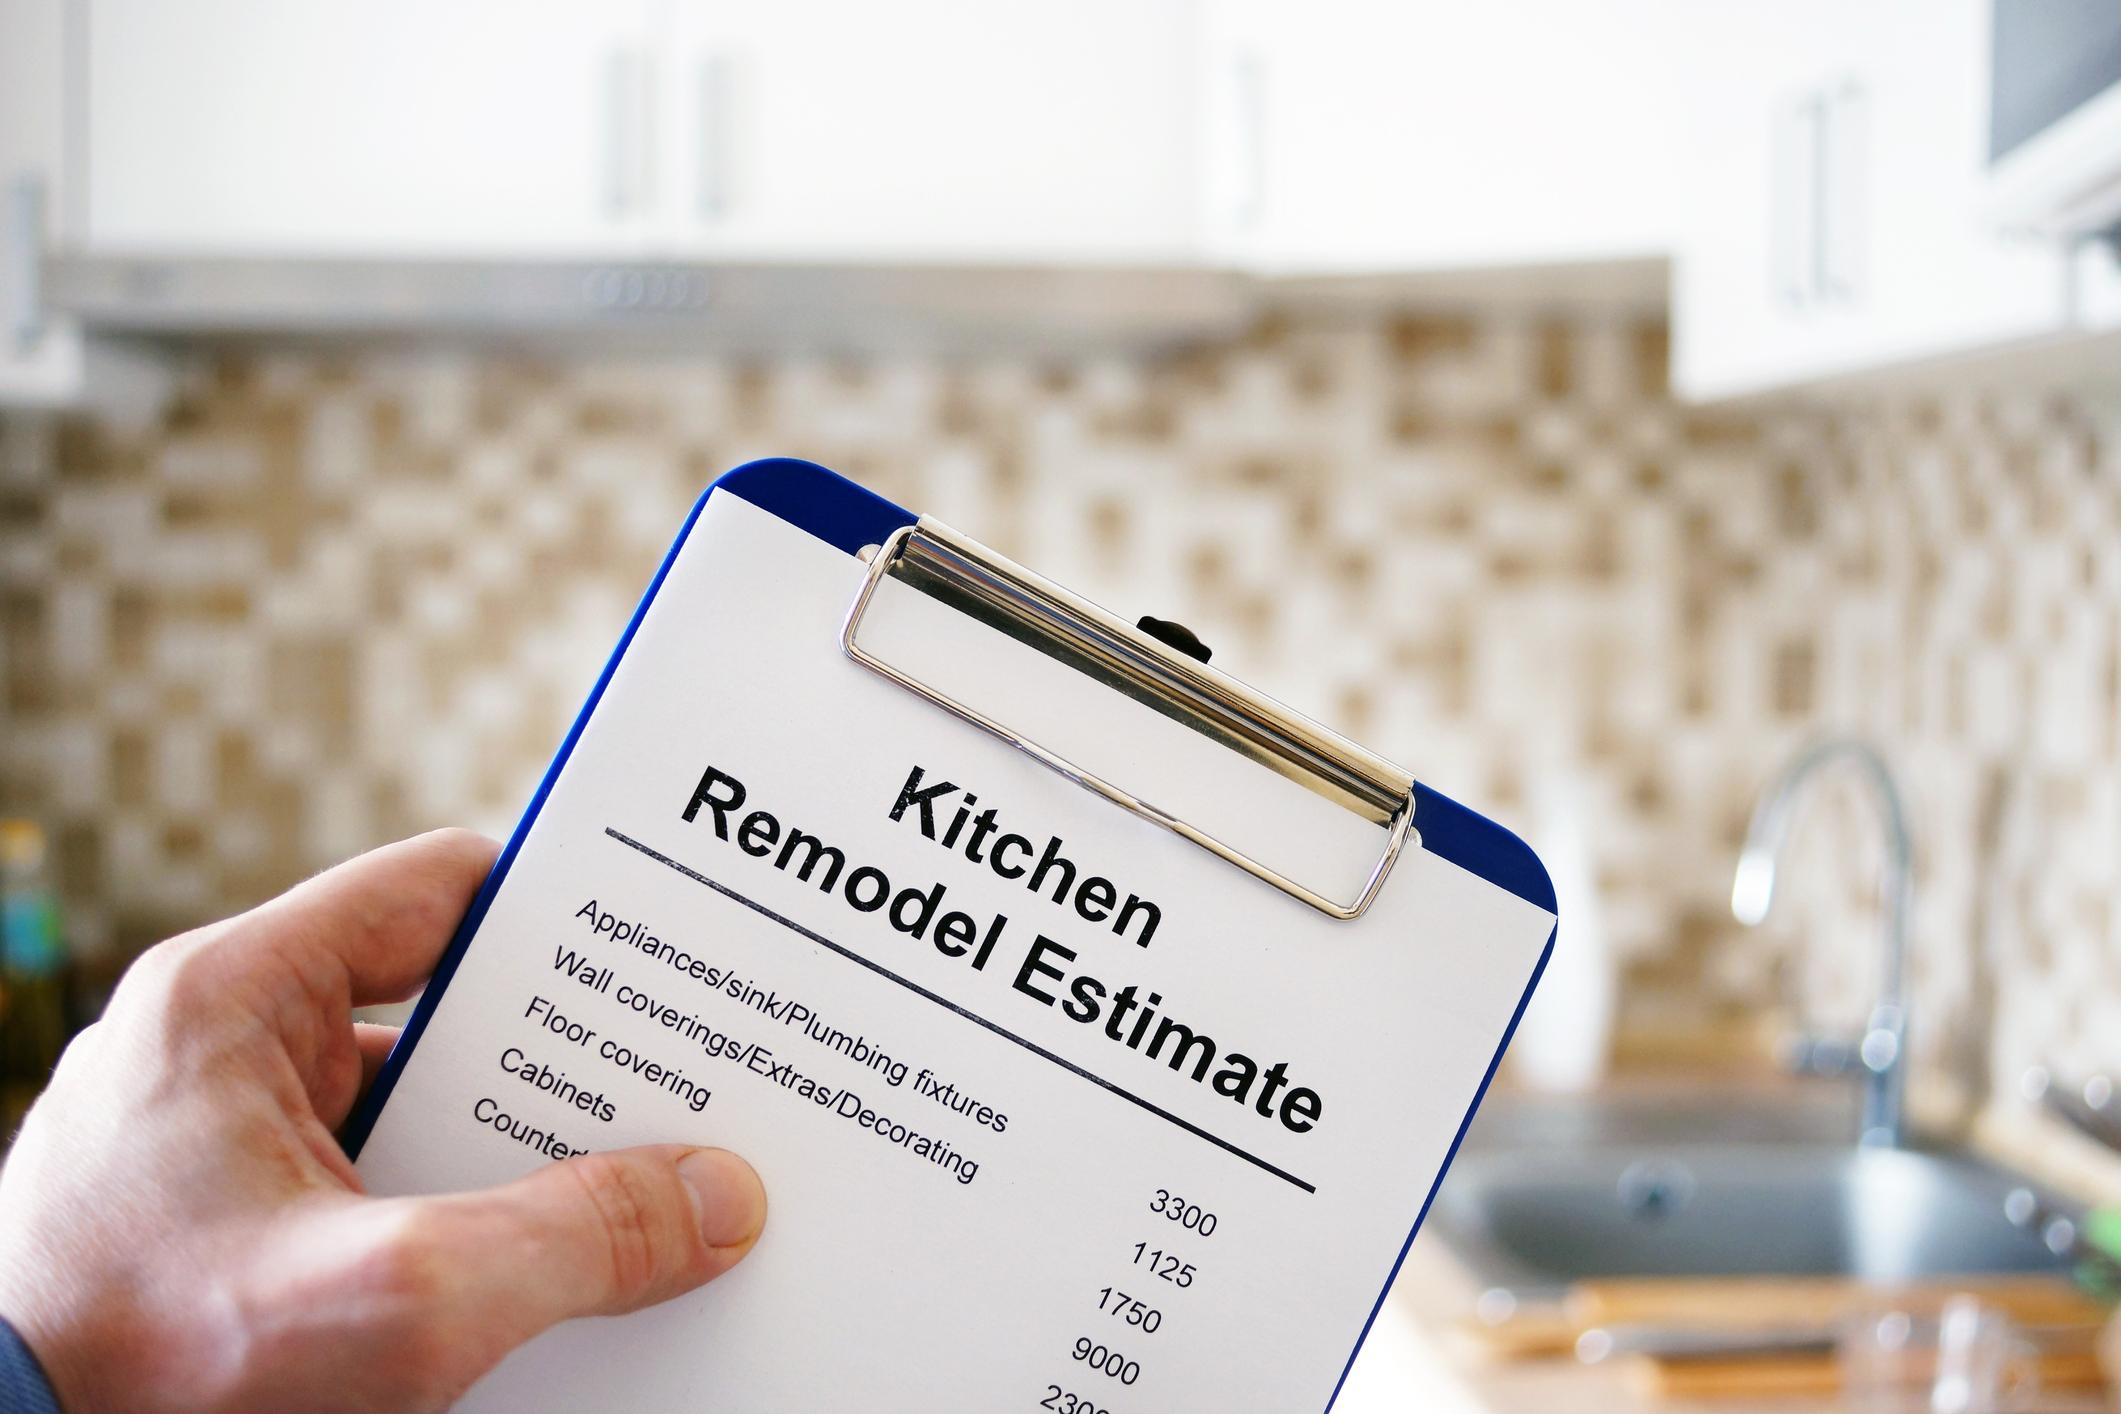 Above Remodeling Kitchen Renovation Estimate Cost of renovation.